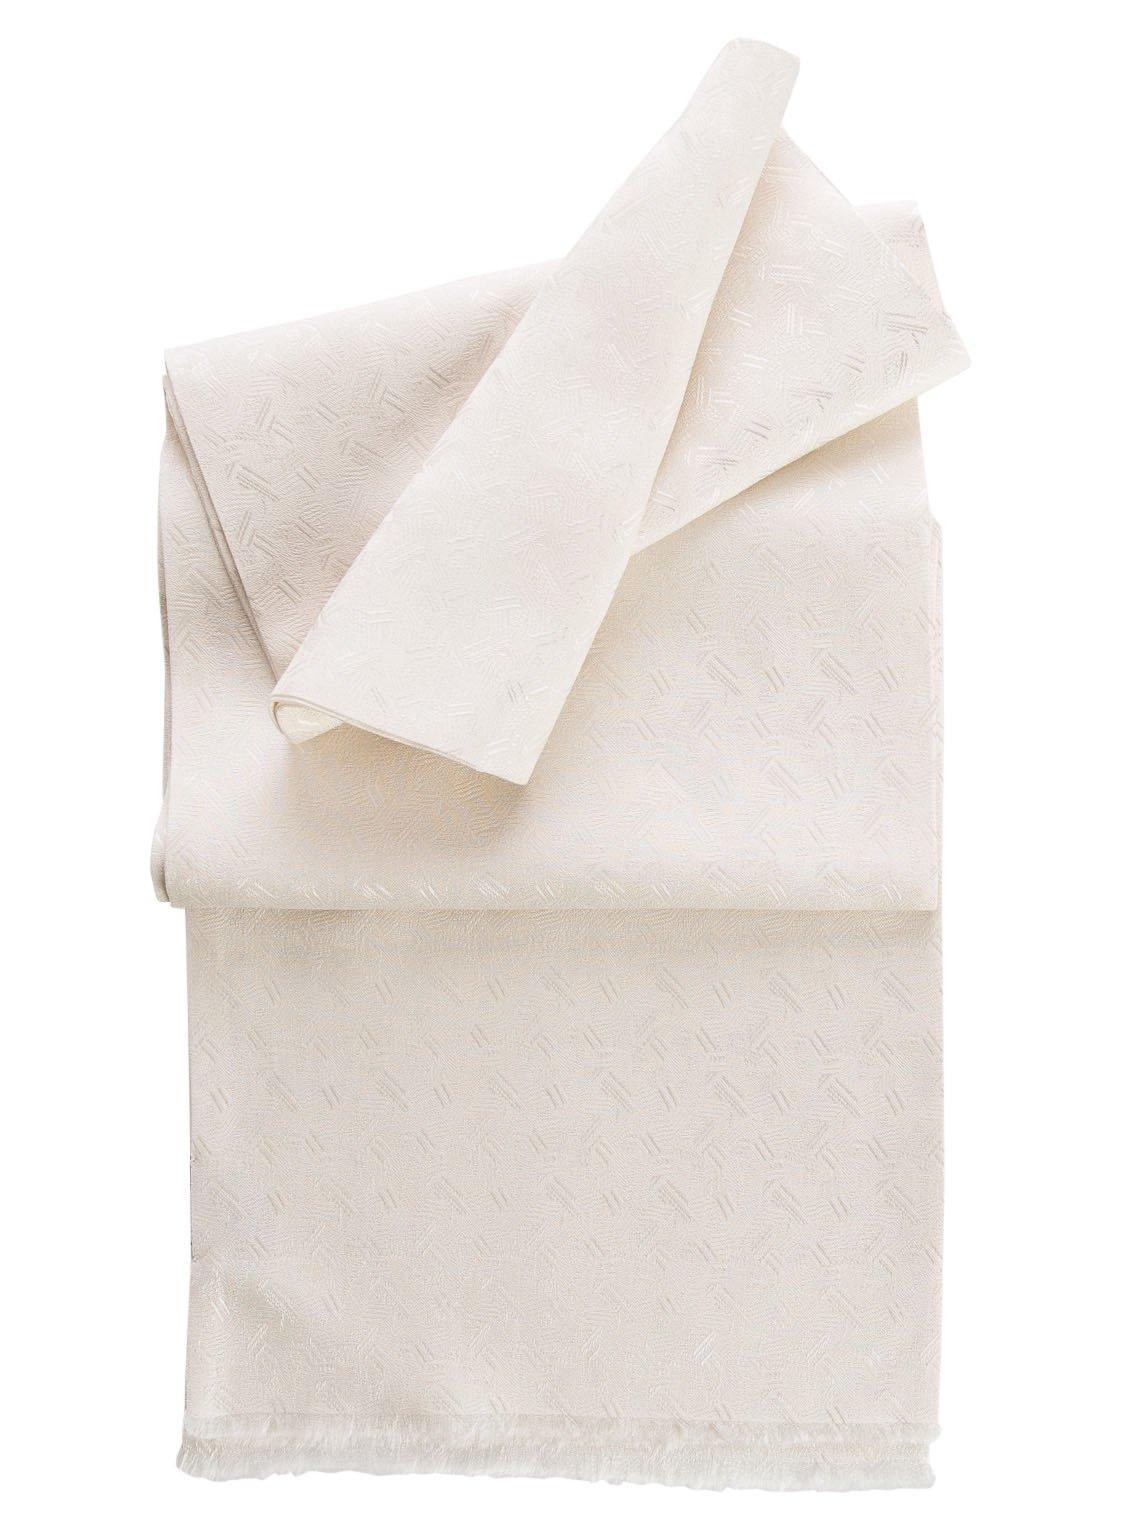 Elizabetta Men's Pure Silk Aviator Opera Scarf, Handmade in Italy, Skinny Soft White